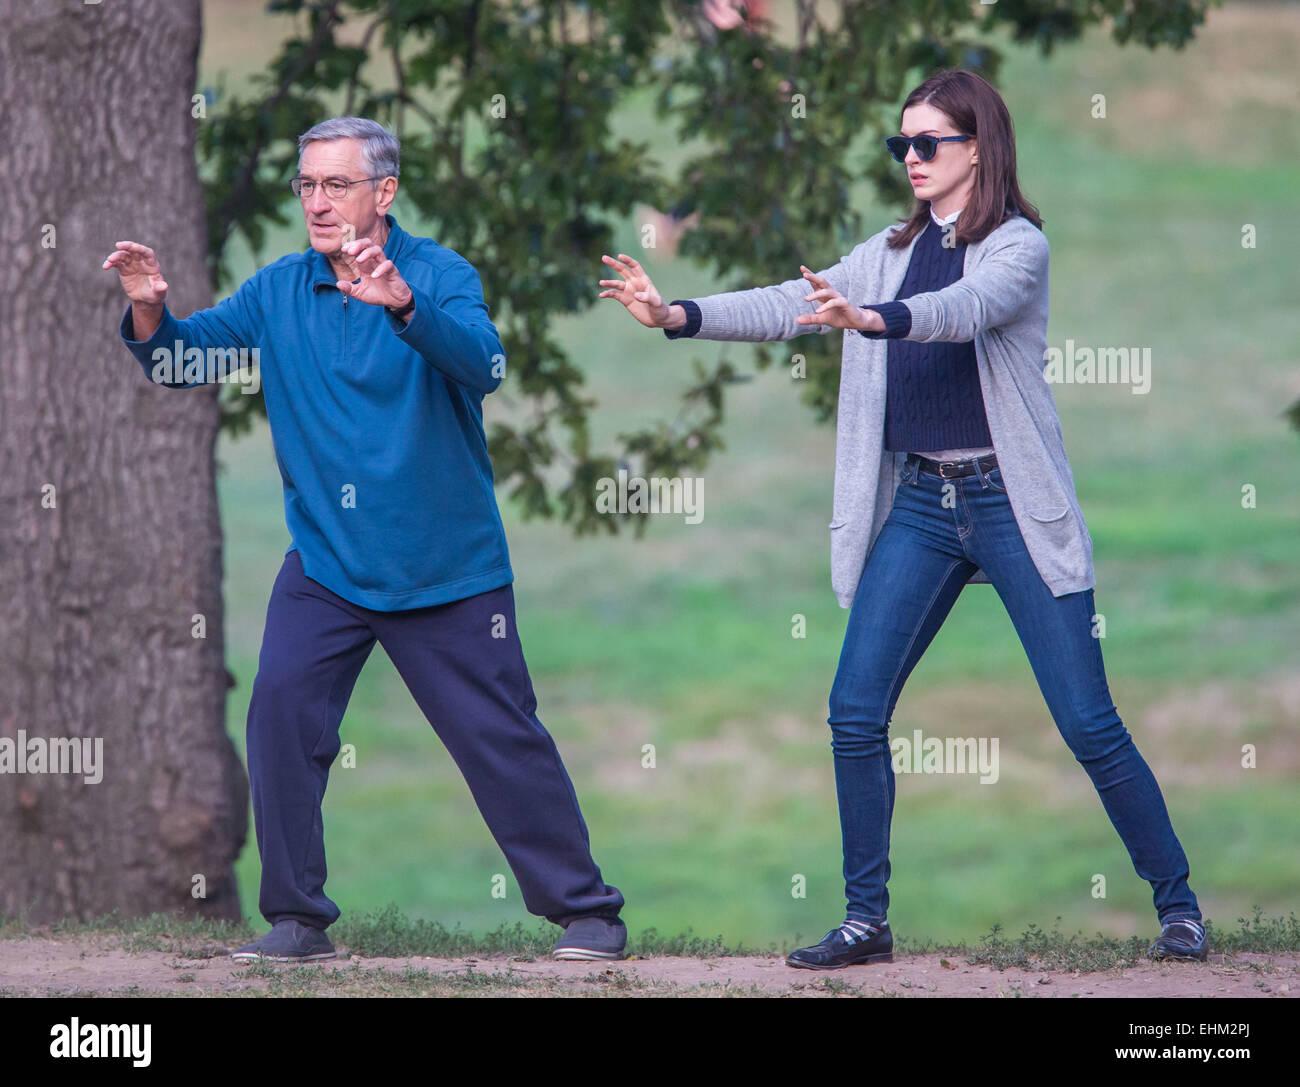 Anne Hathaway And Robert De Niro: Robert De Niro And Anne Hathaway Doing Tai Chi On The Set